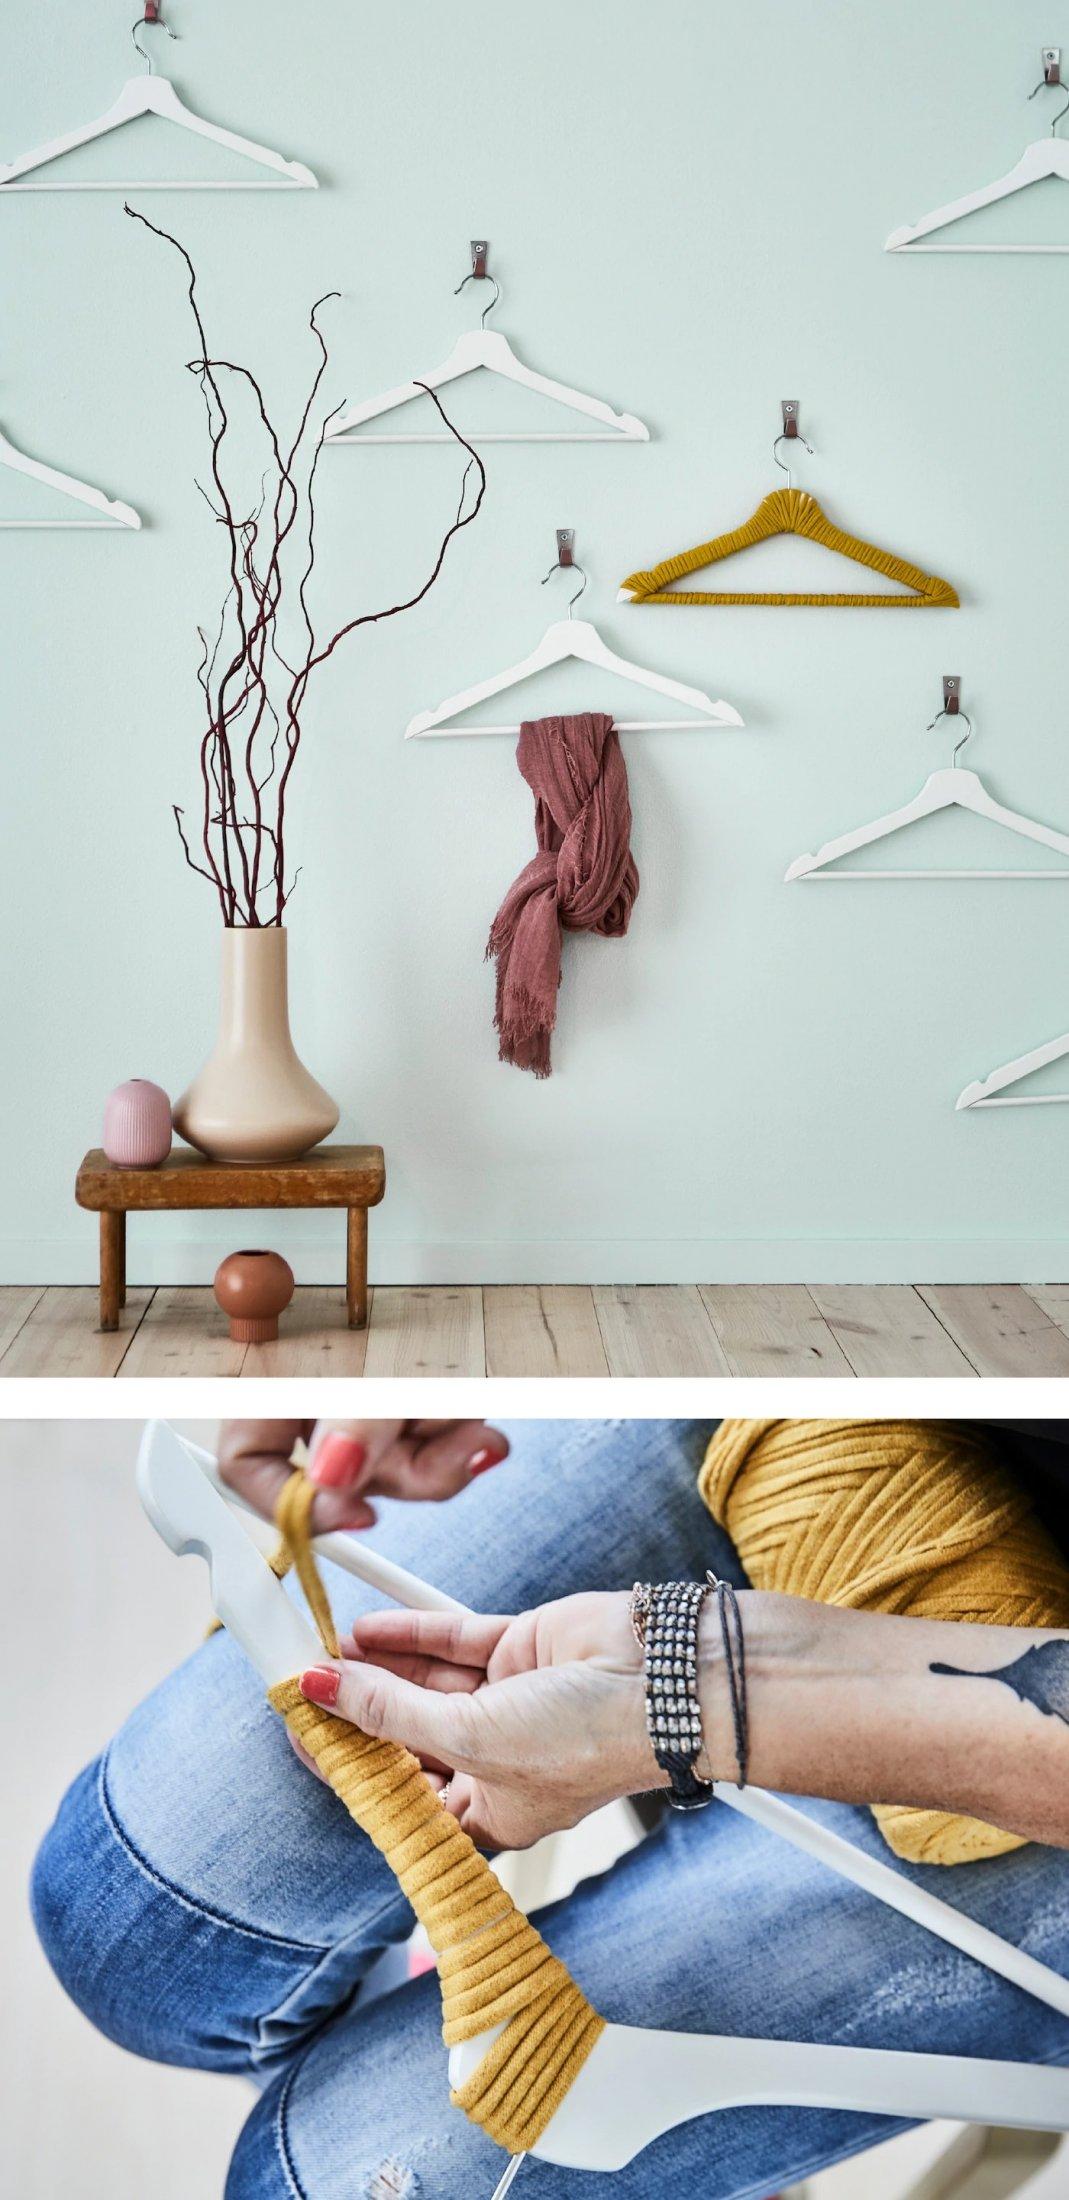 ikea duvar aksesuarlari ile dekorasyon fikirleri (30)-min-min